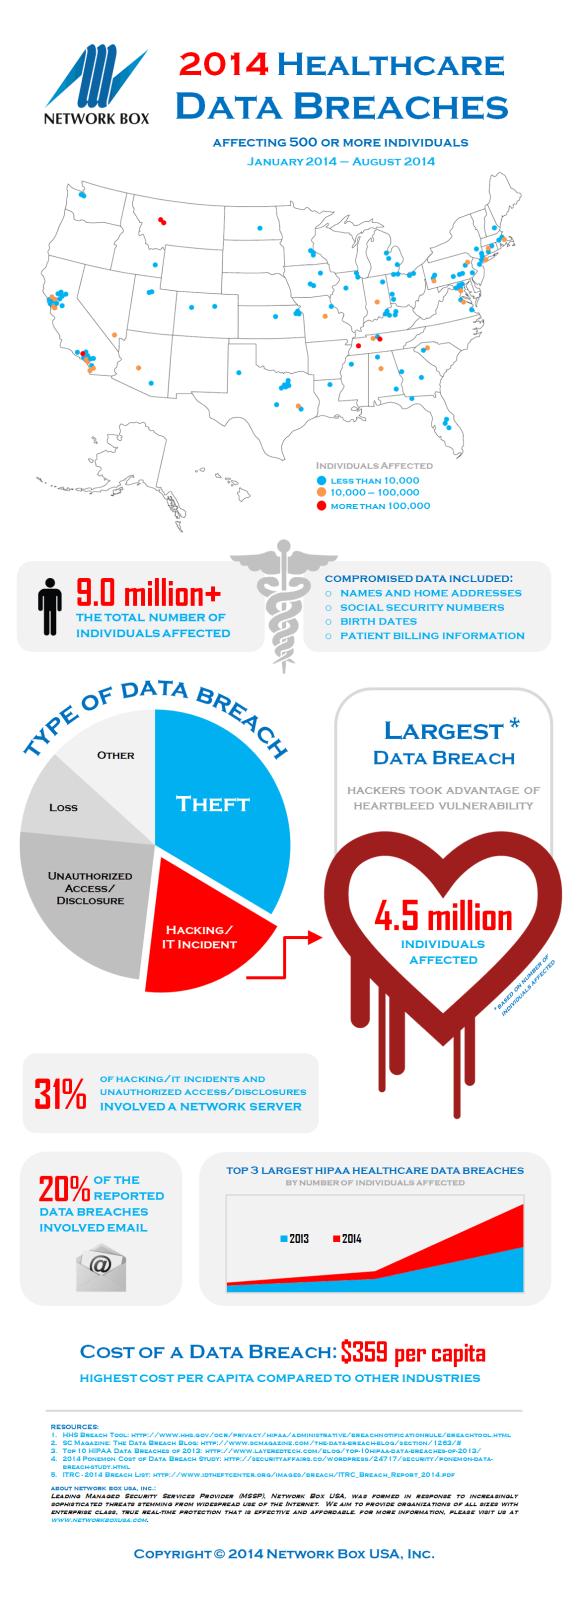 2014 Healthcare Data Breaches